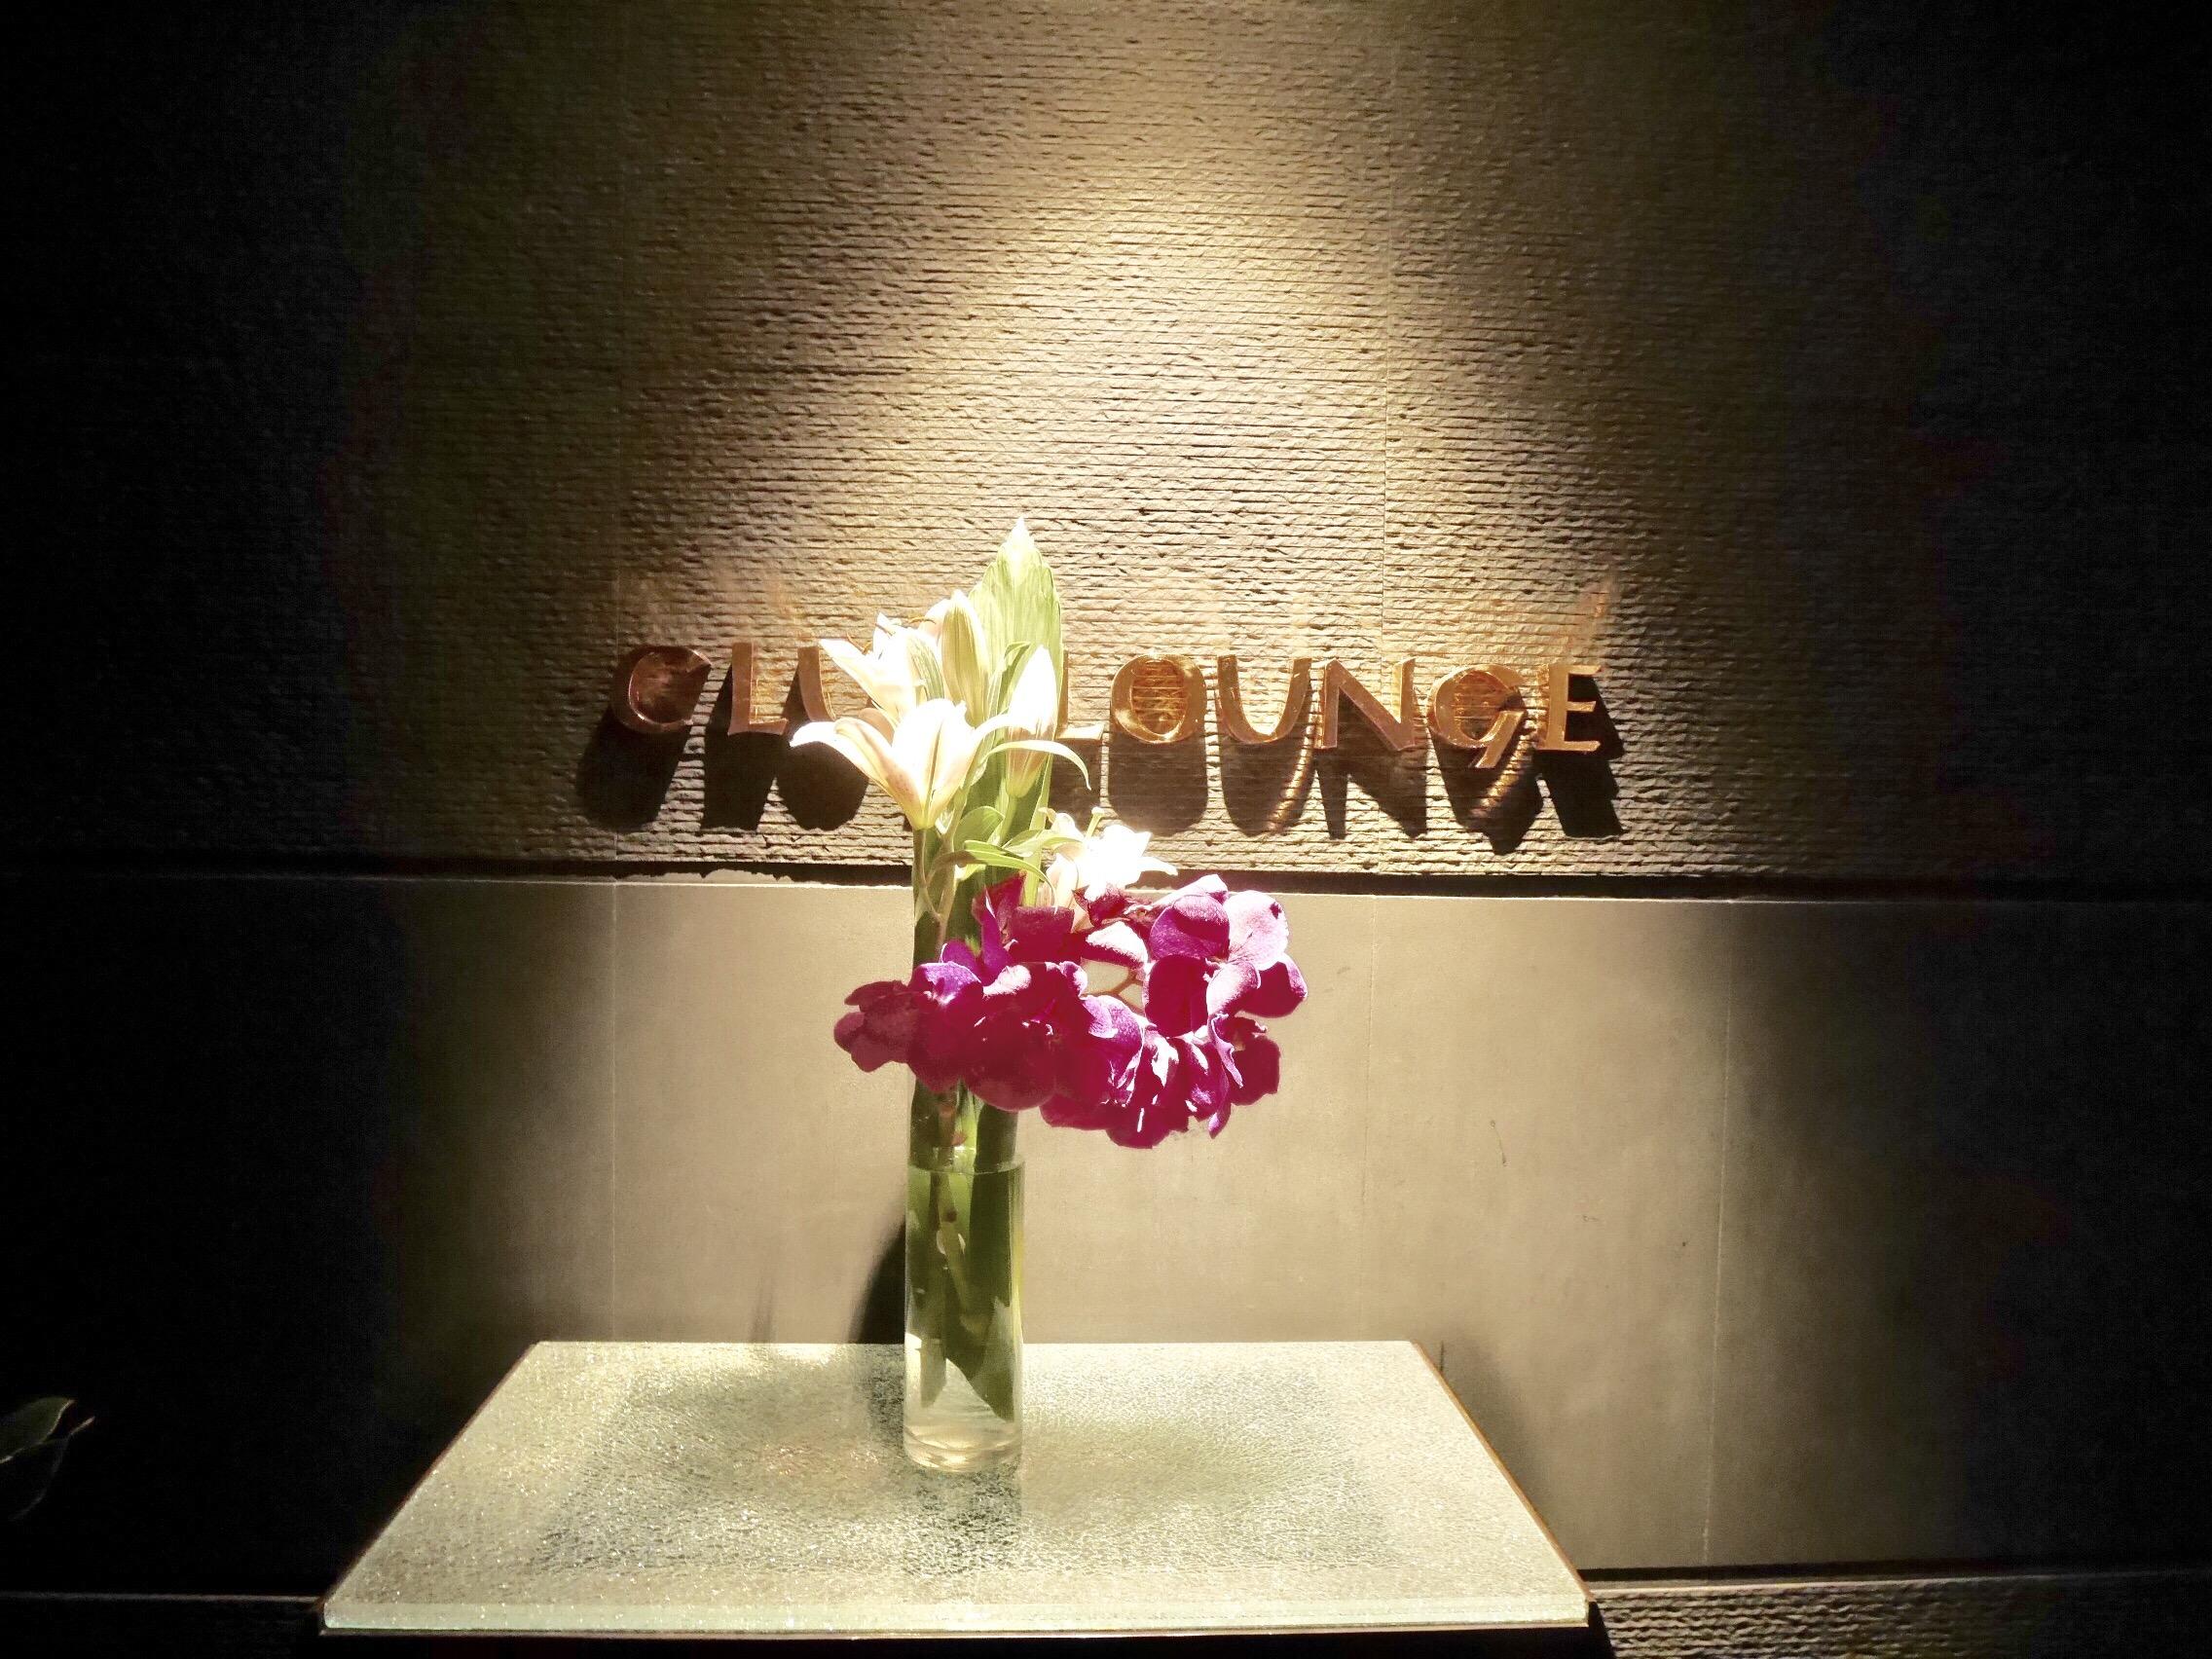 img 8215 - Banyan Tree Bangkok - 五つ星ホテルバンヤンツリーのSERENITY CLUBで過ごすリュクスな時間 「客室編」